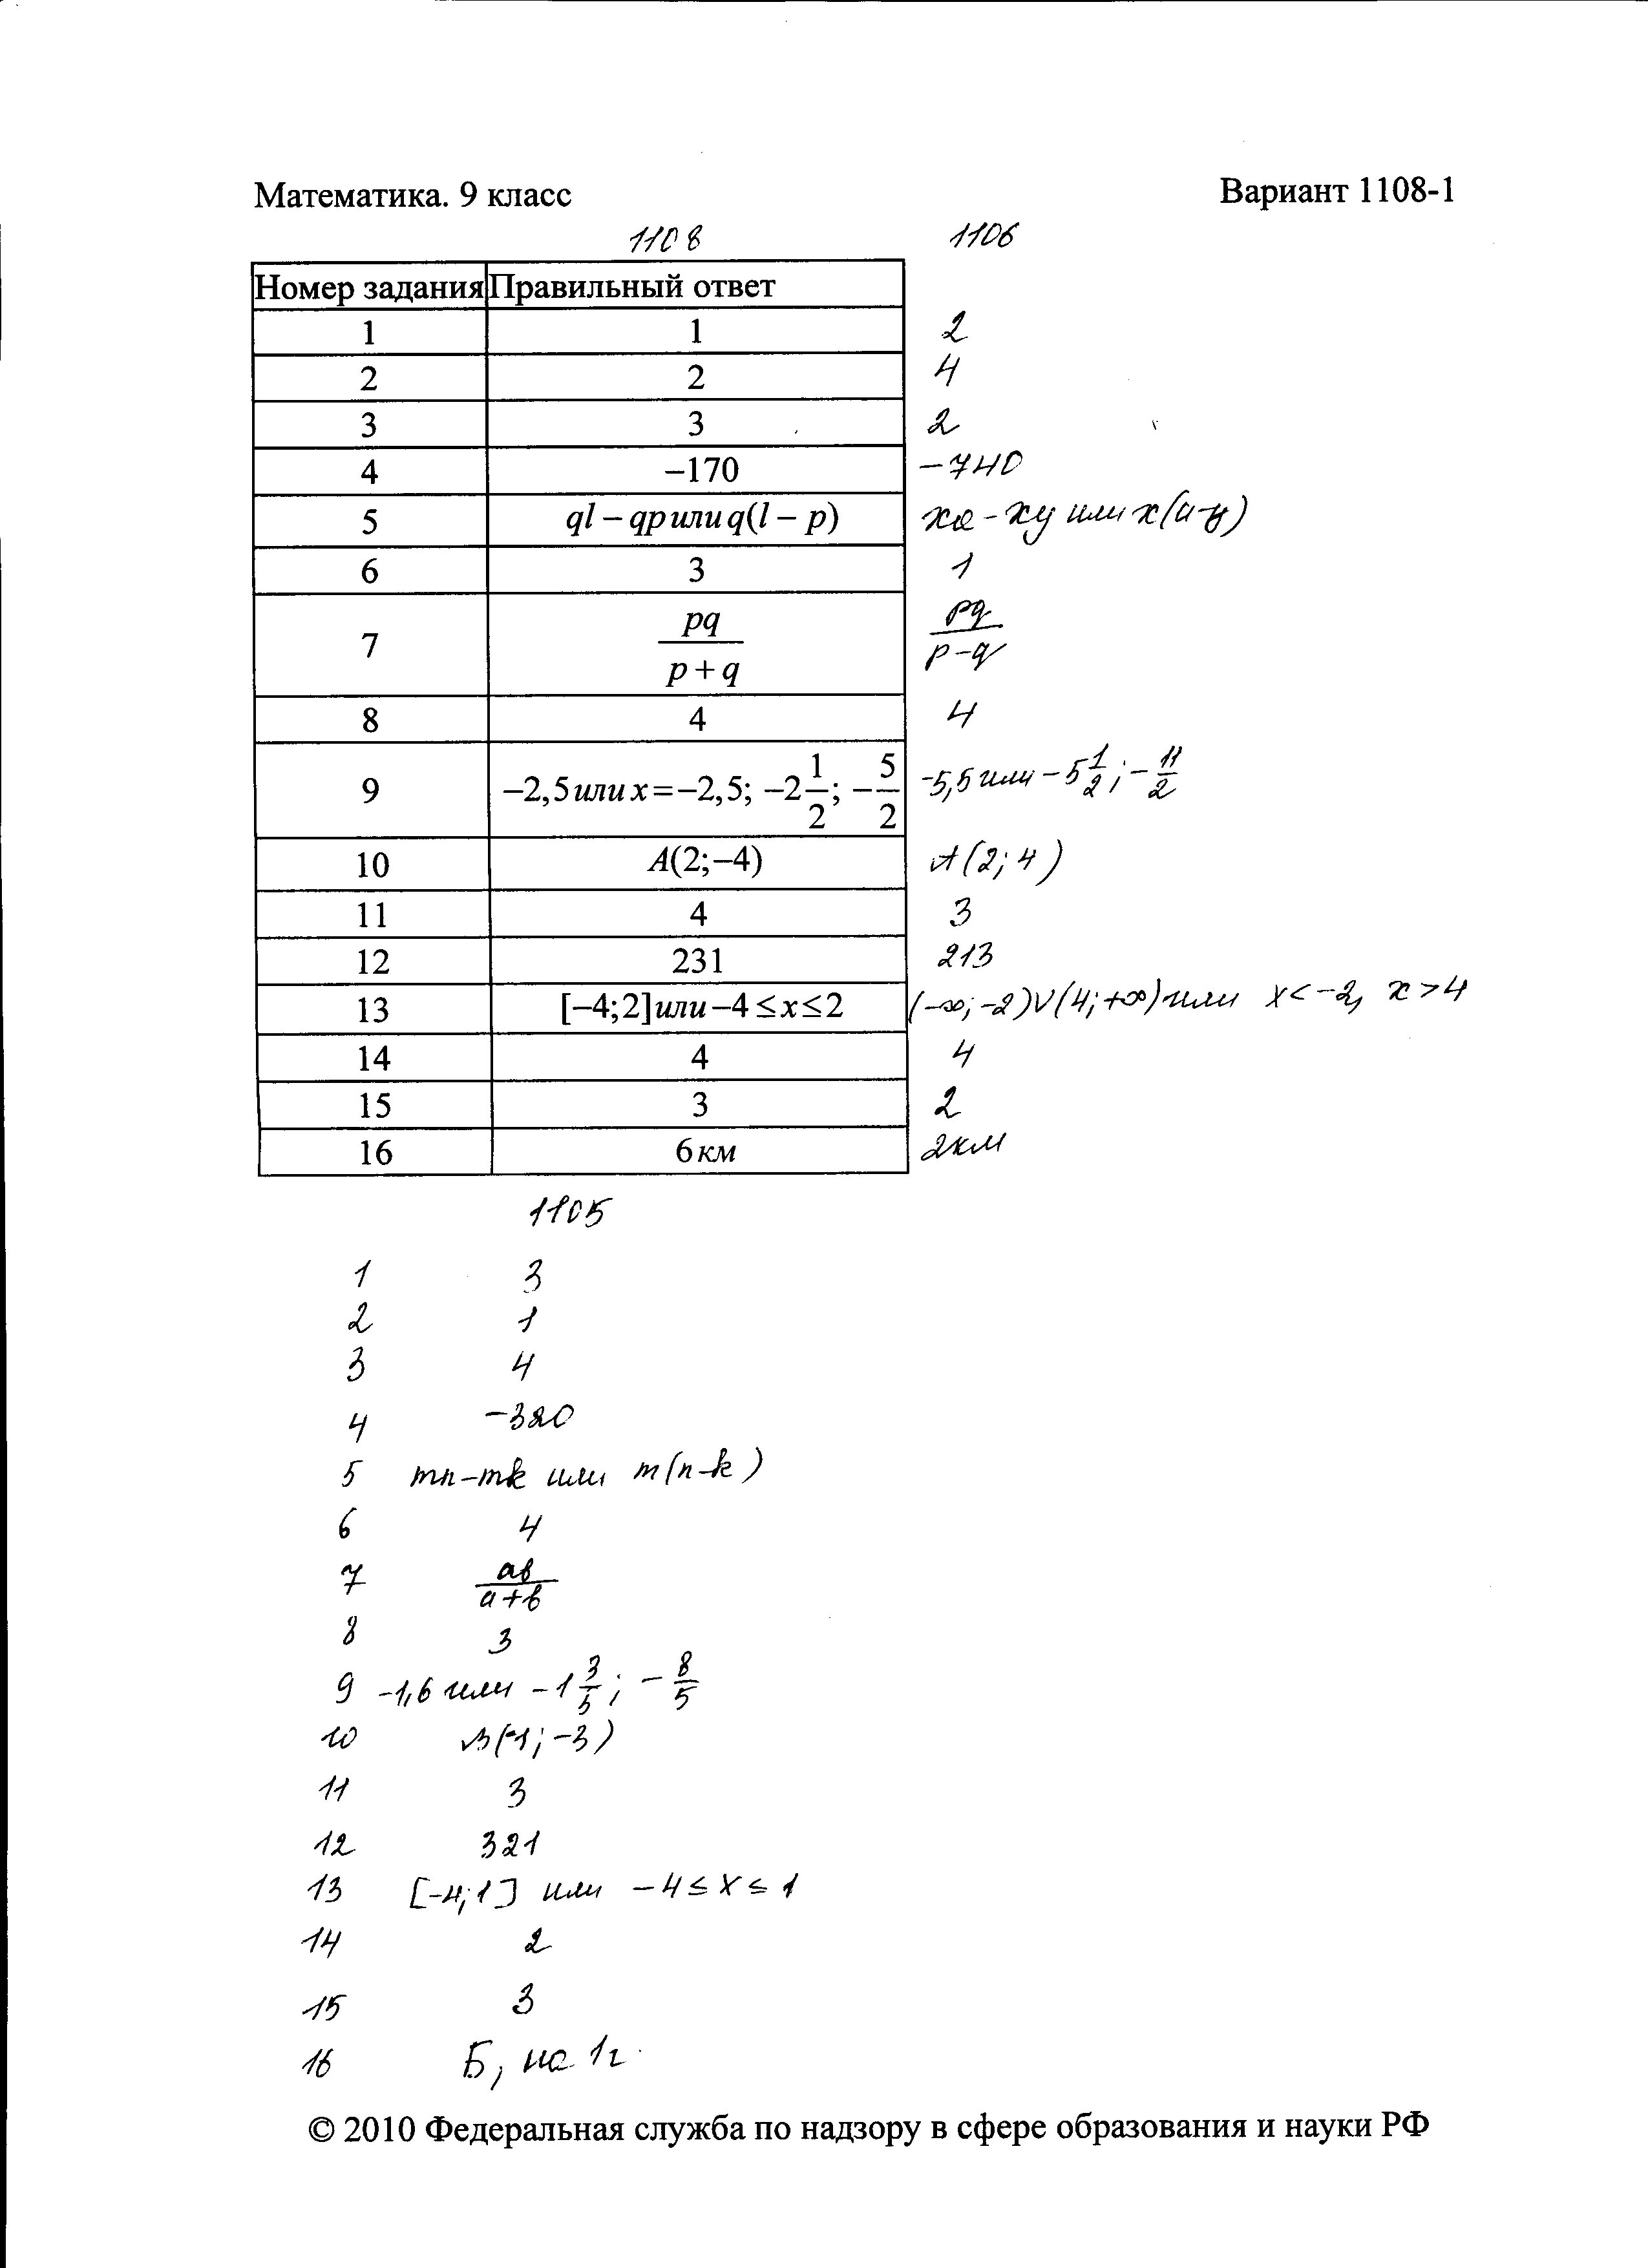 Решебник огэ по математике 2017 alexlarin